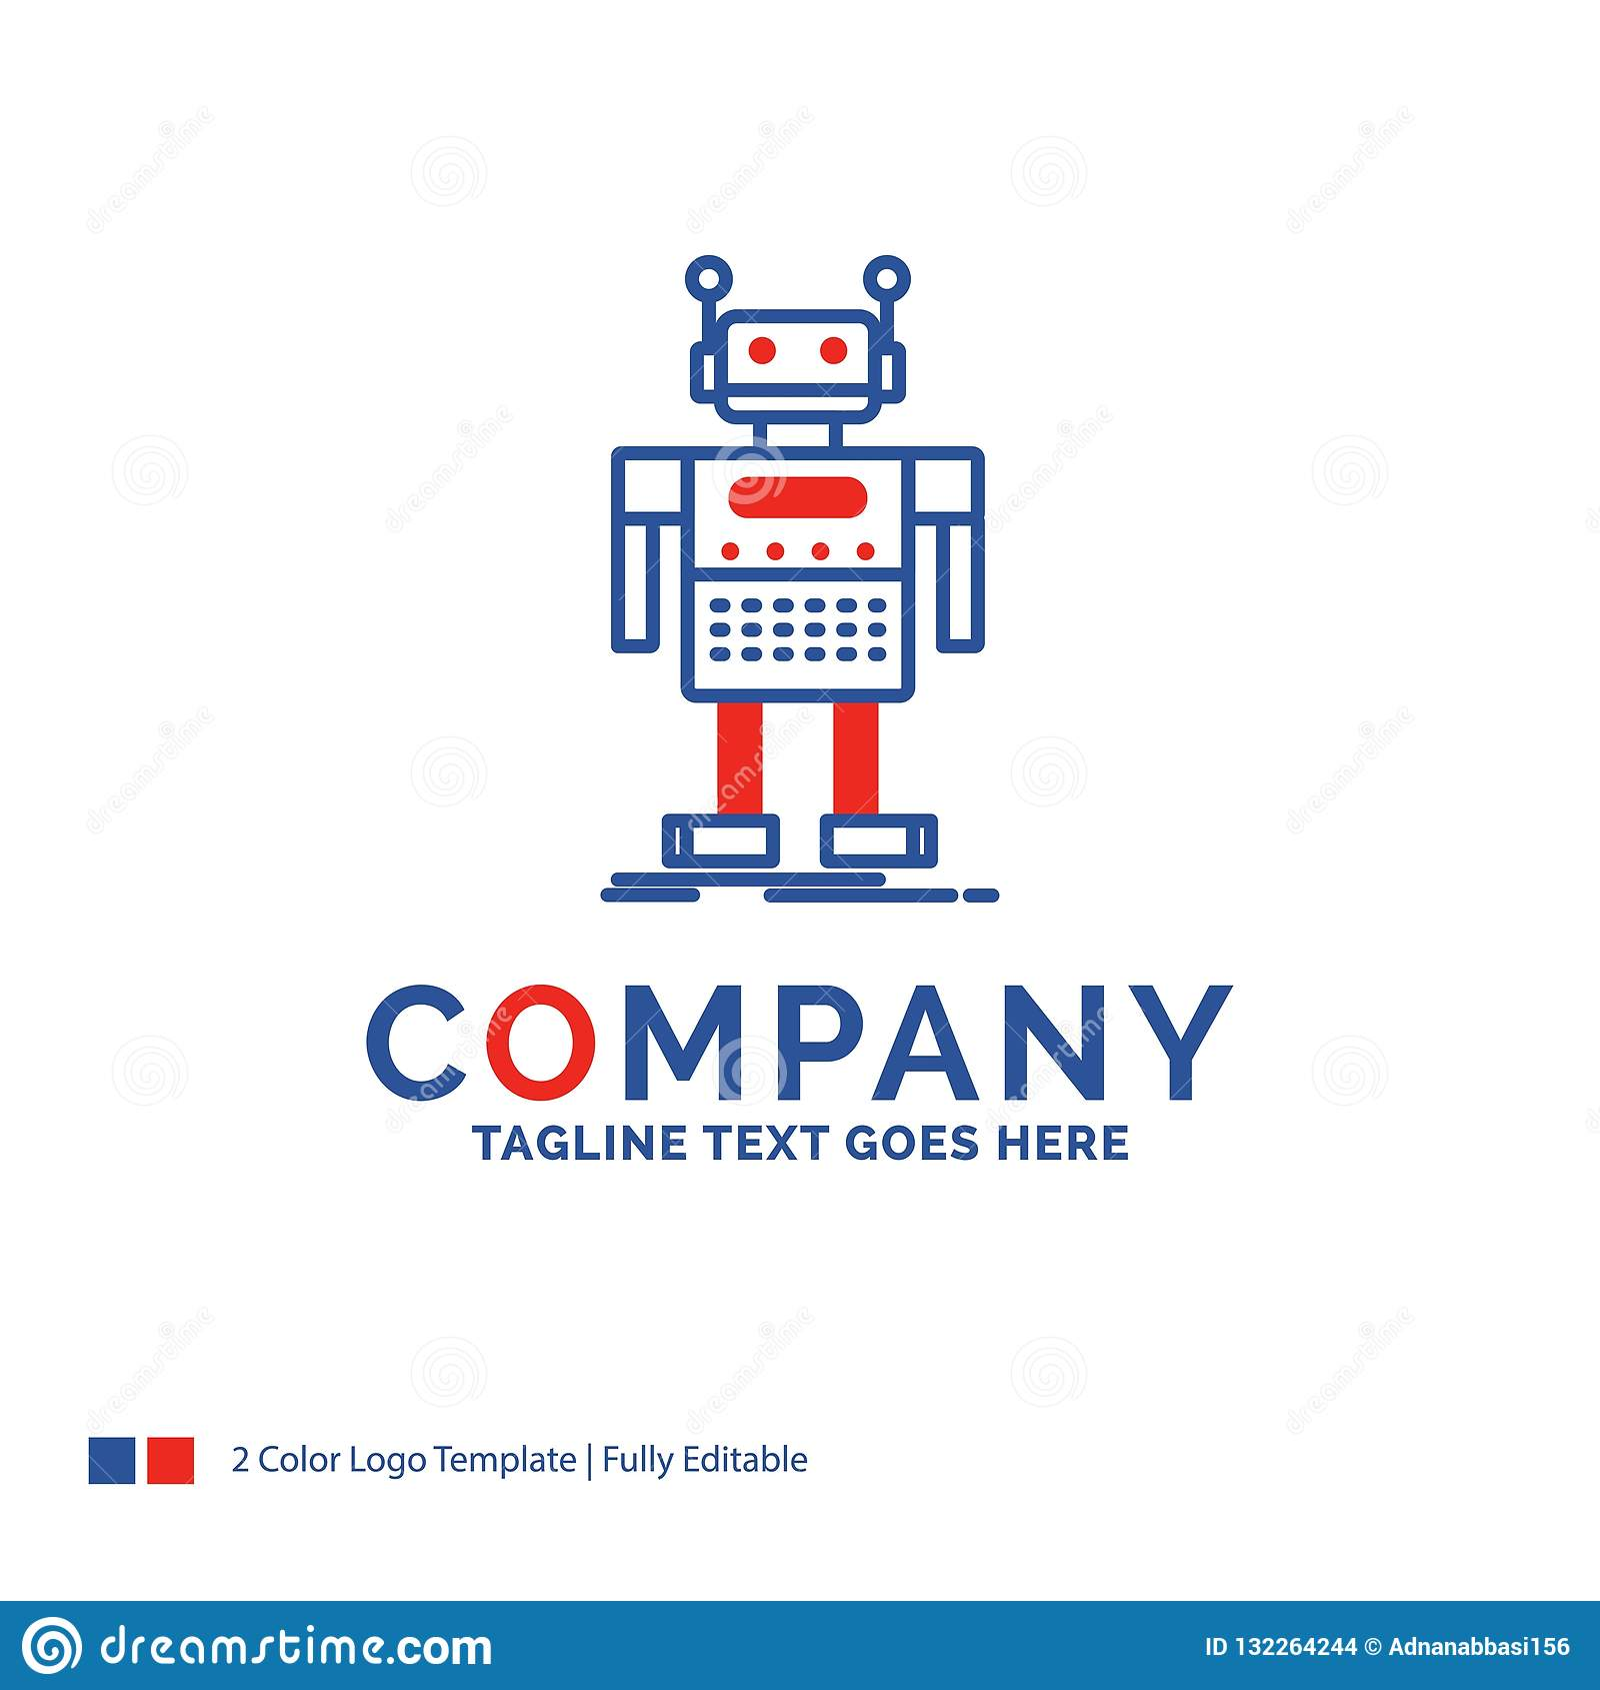 Company Name Logo Design For robot, Android, artificial, bot, te